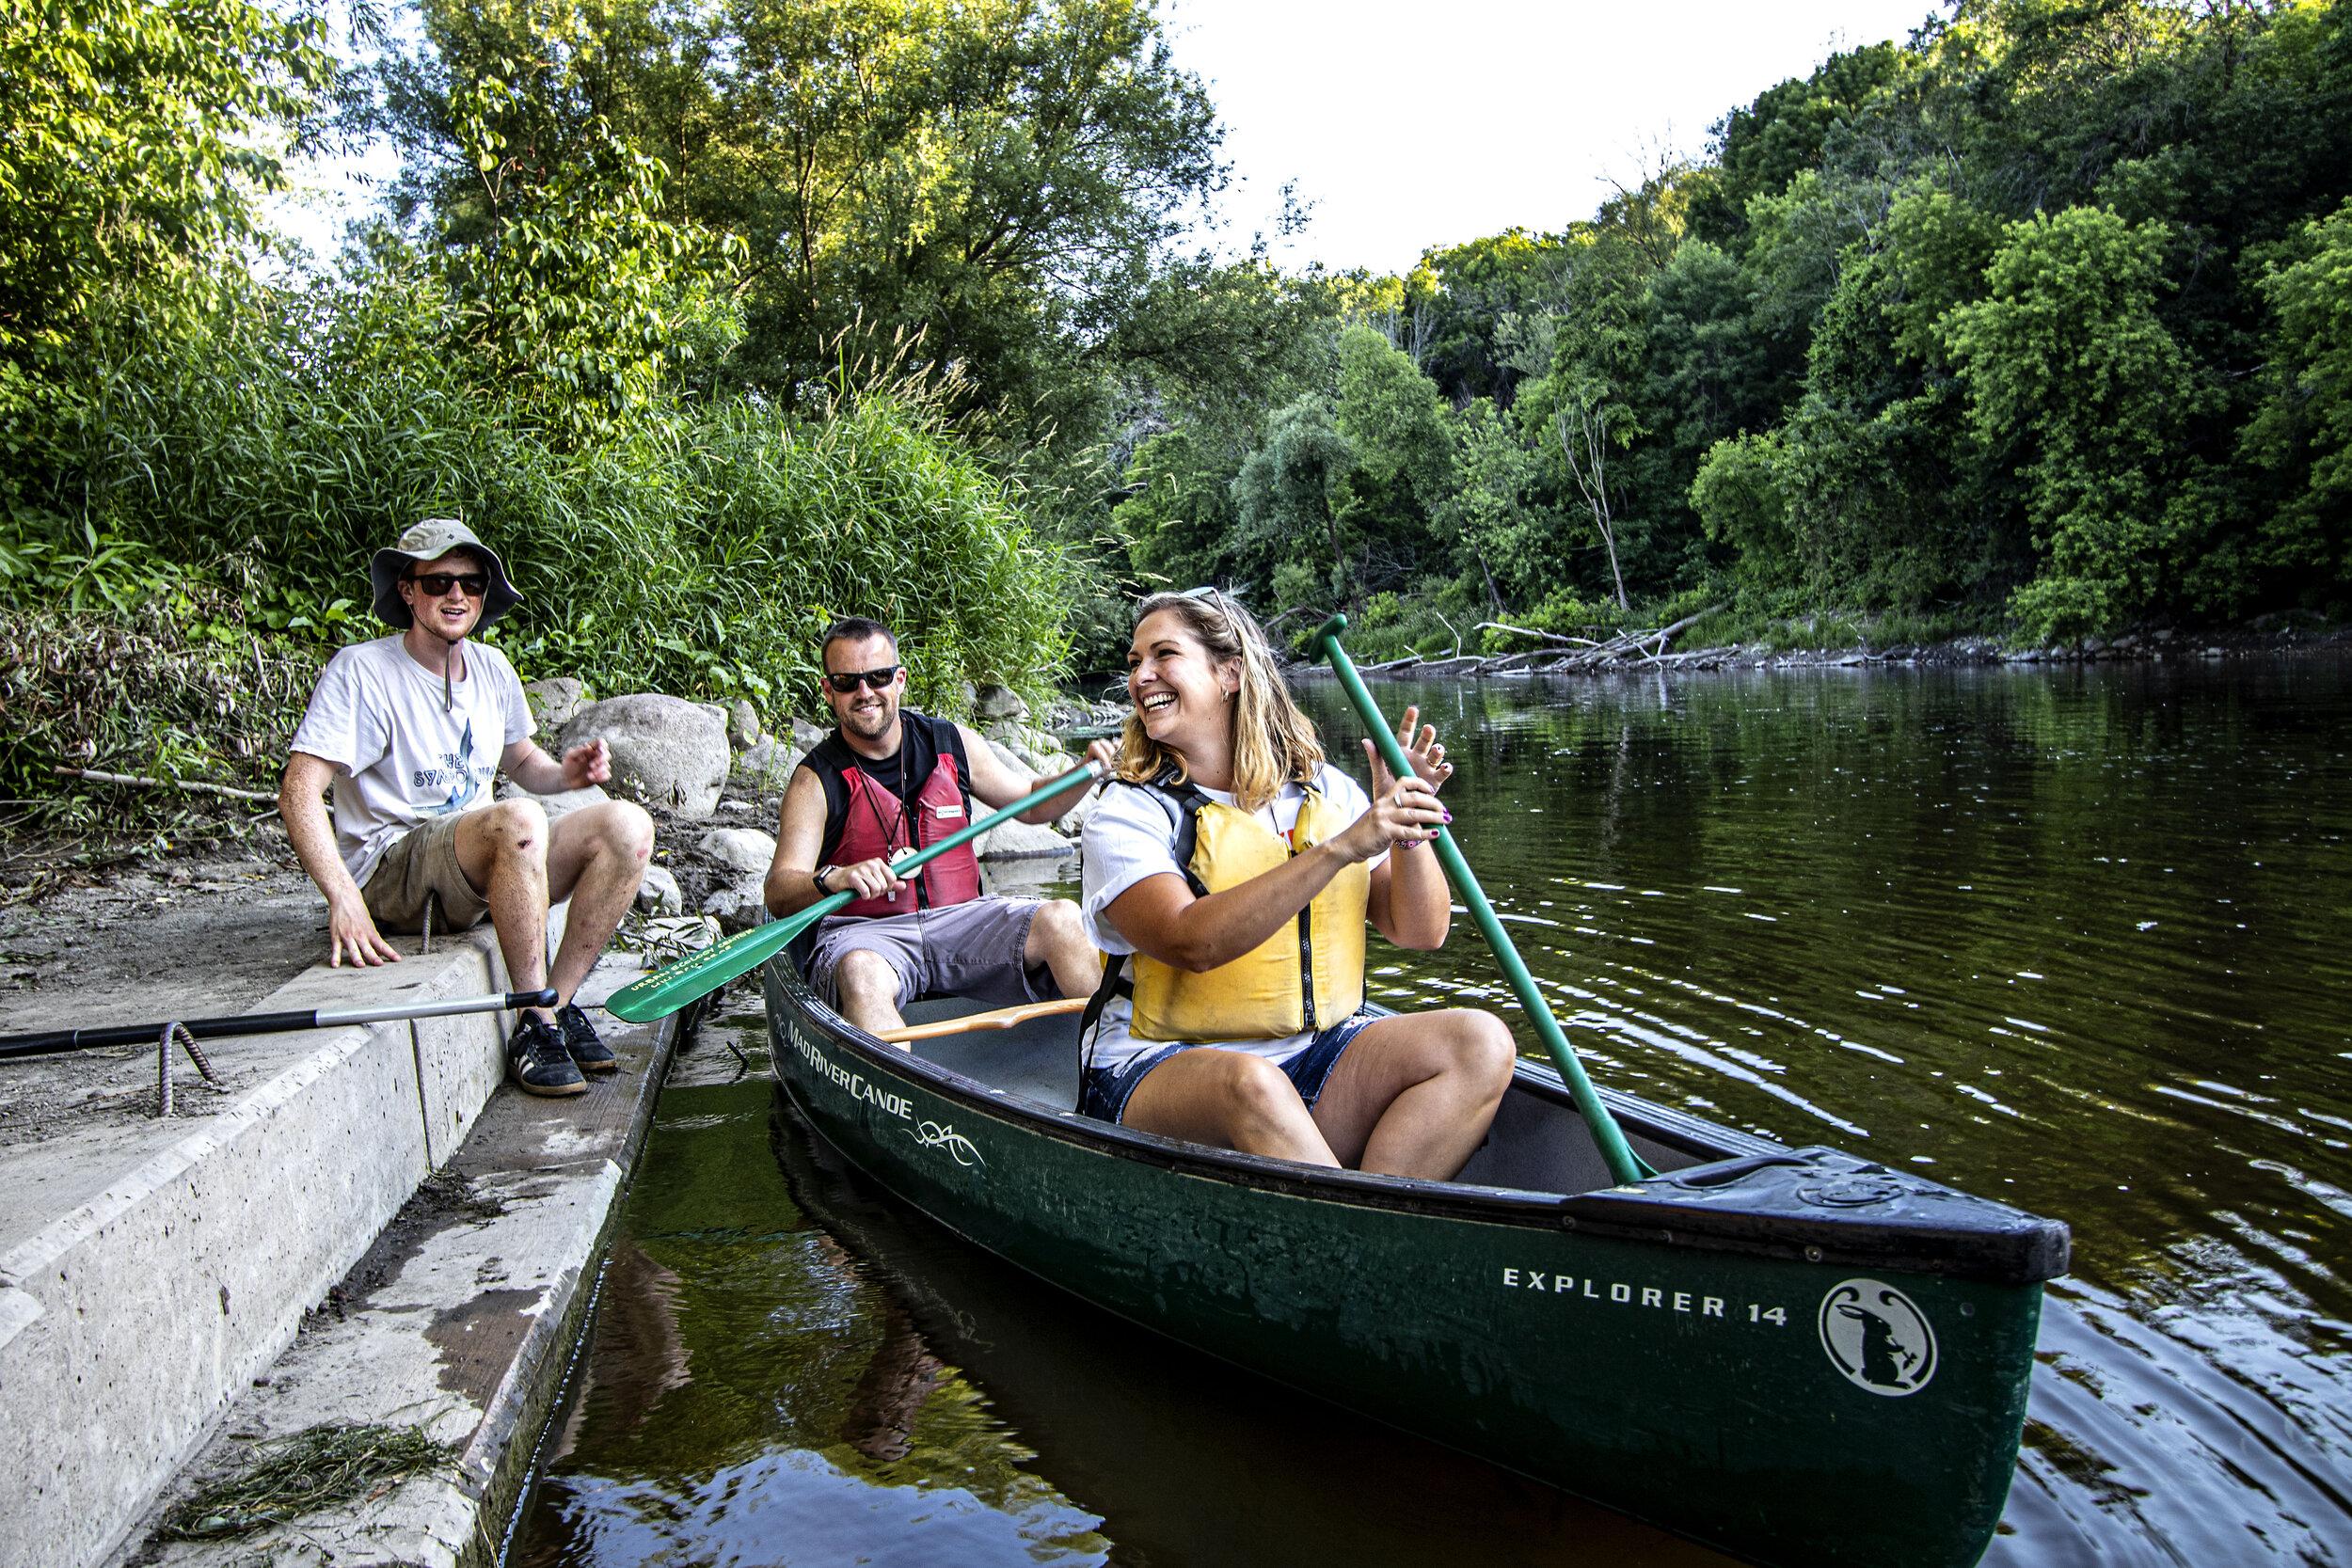 UEC_Grown-Up Summer Camp_Activities_Canoeing_108_20190712_IMG_8293.jpg